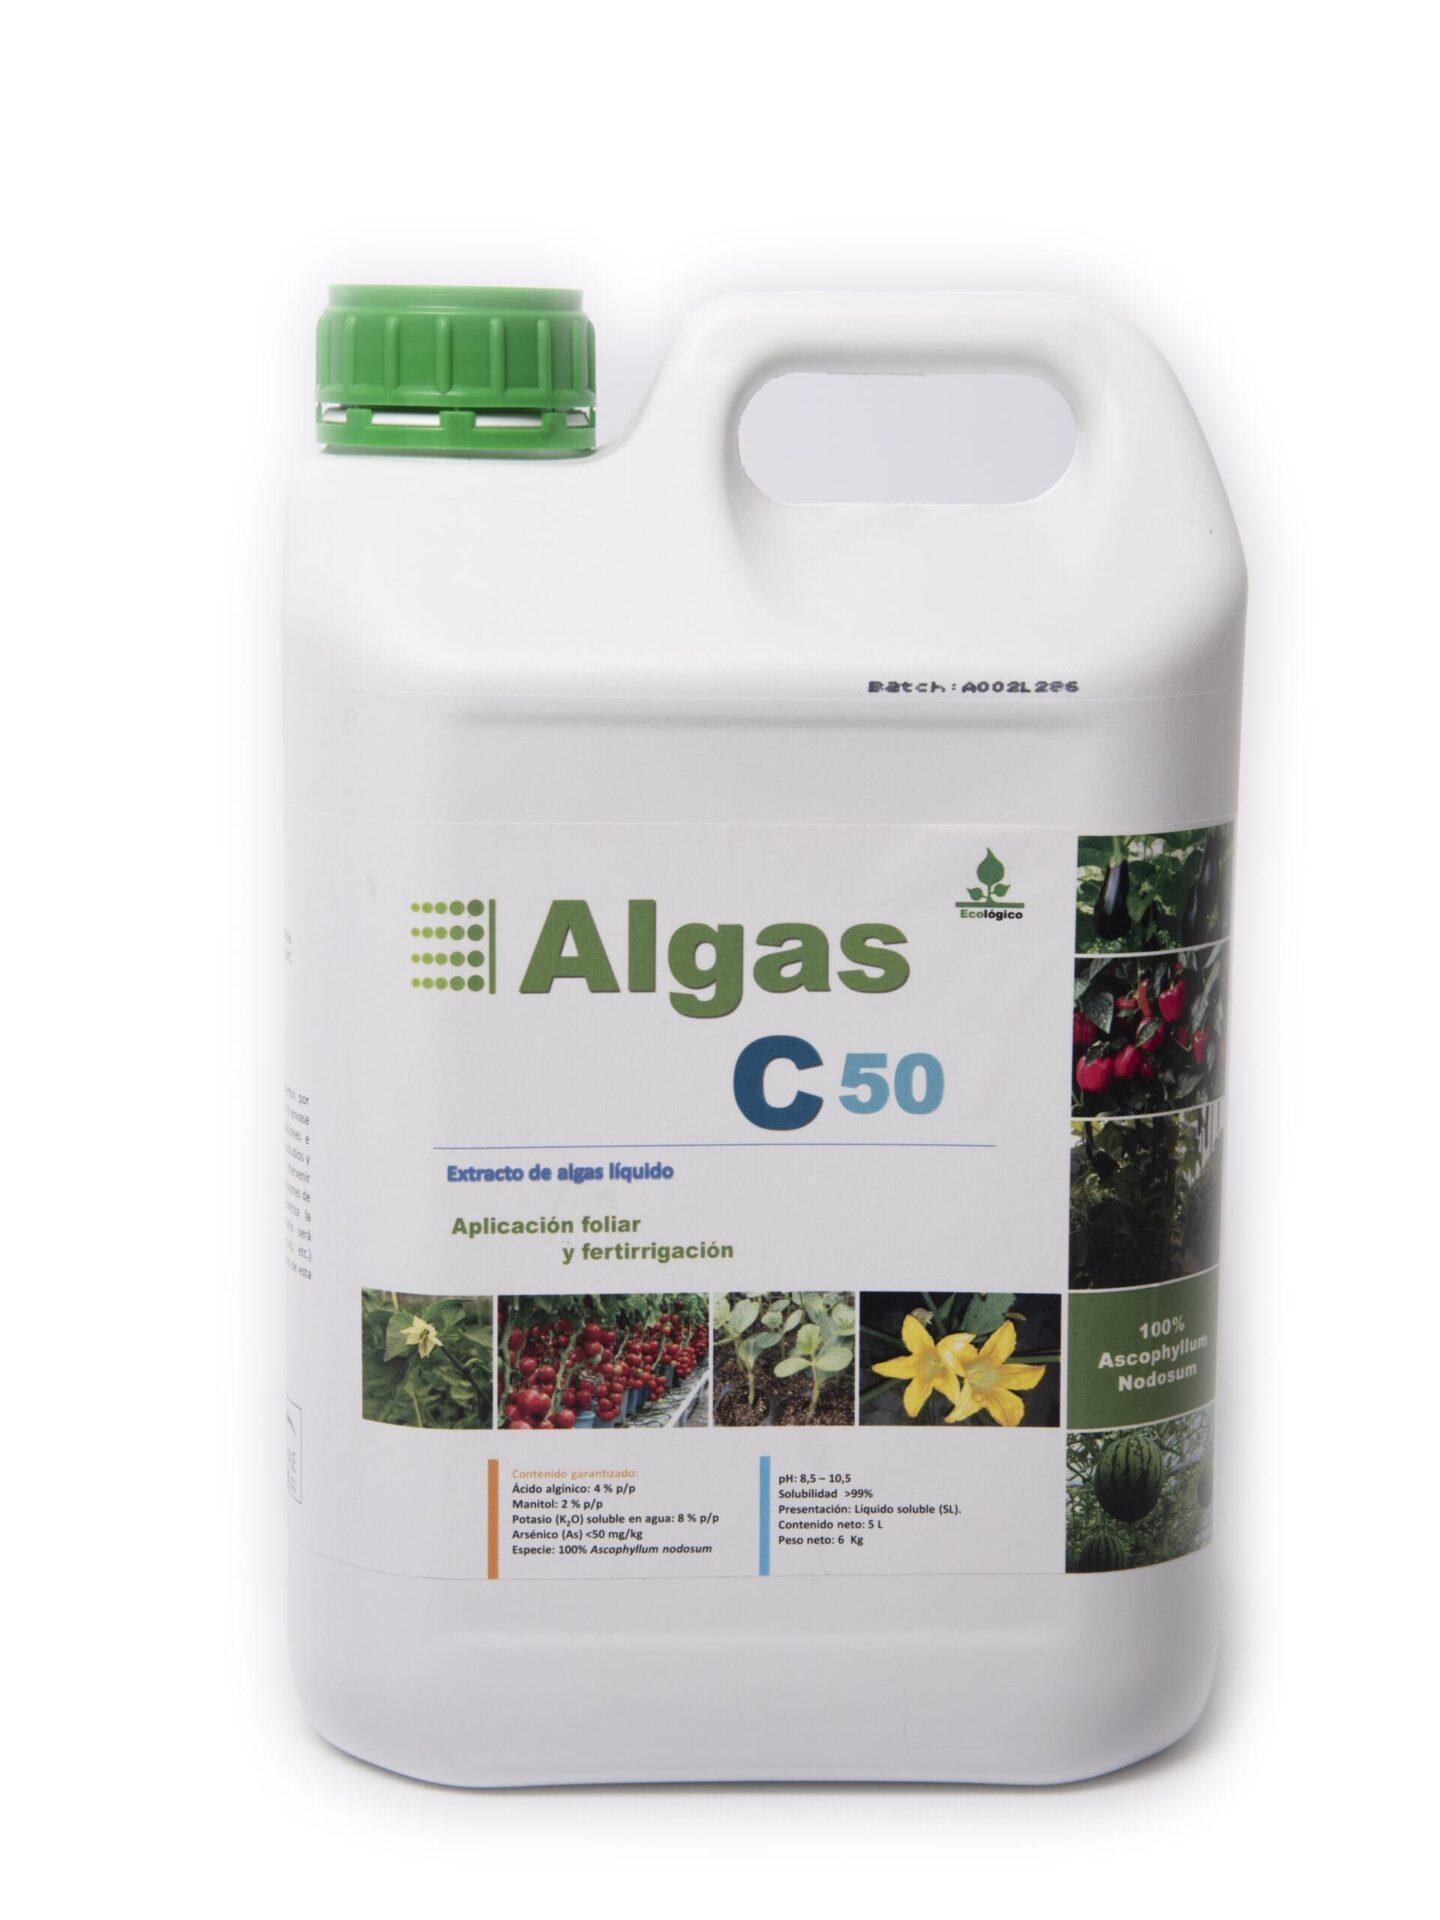 Algas C50